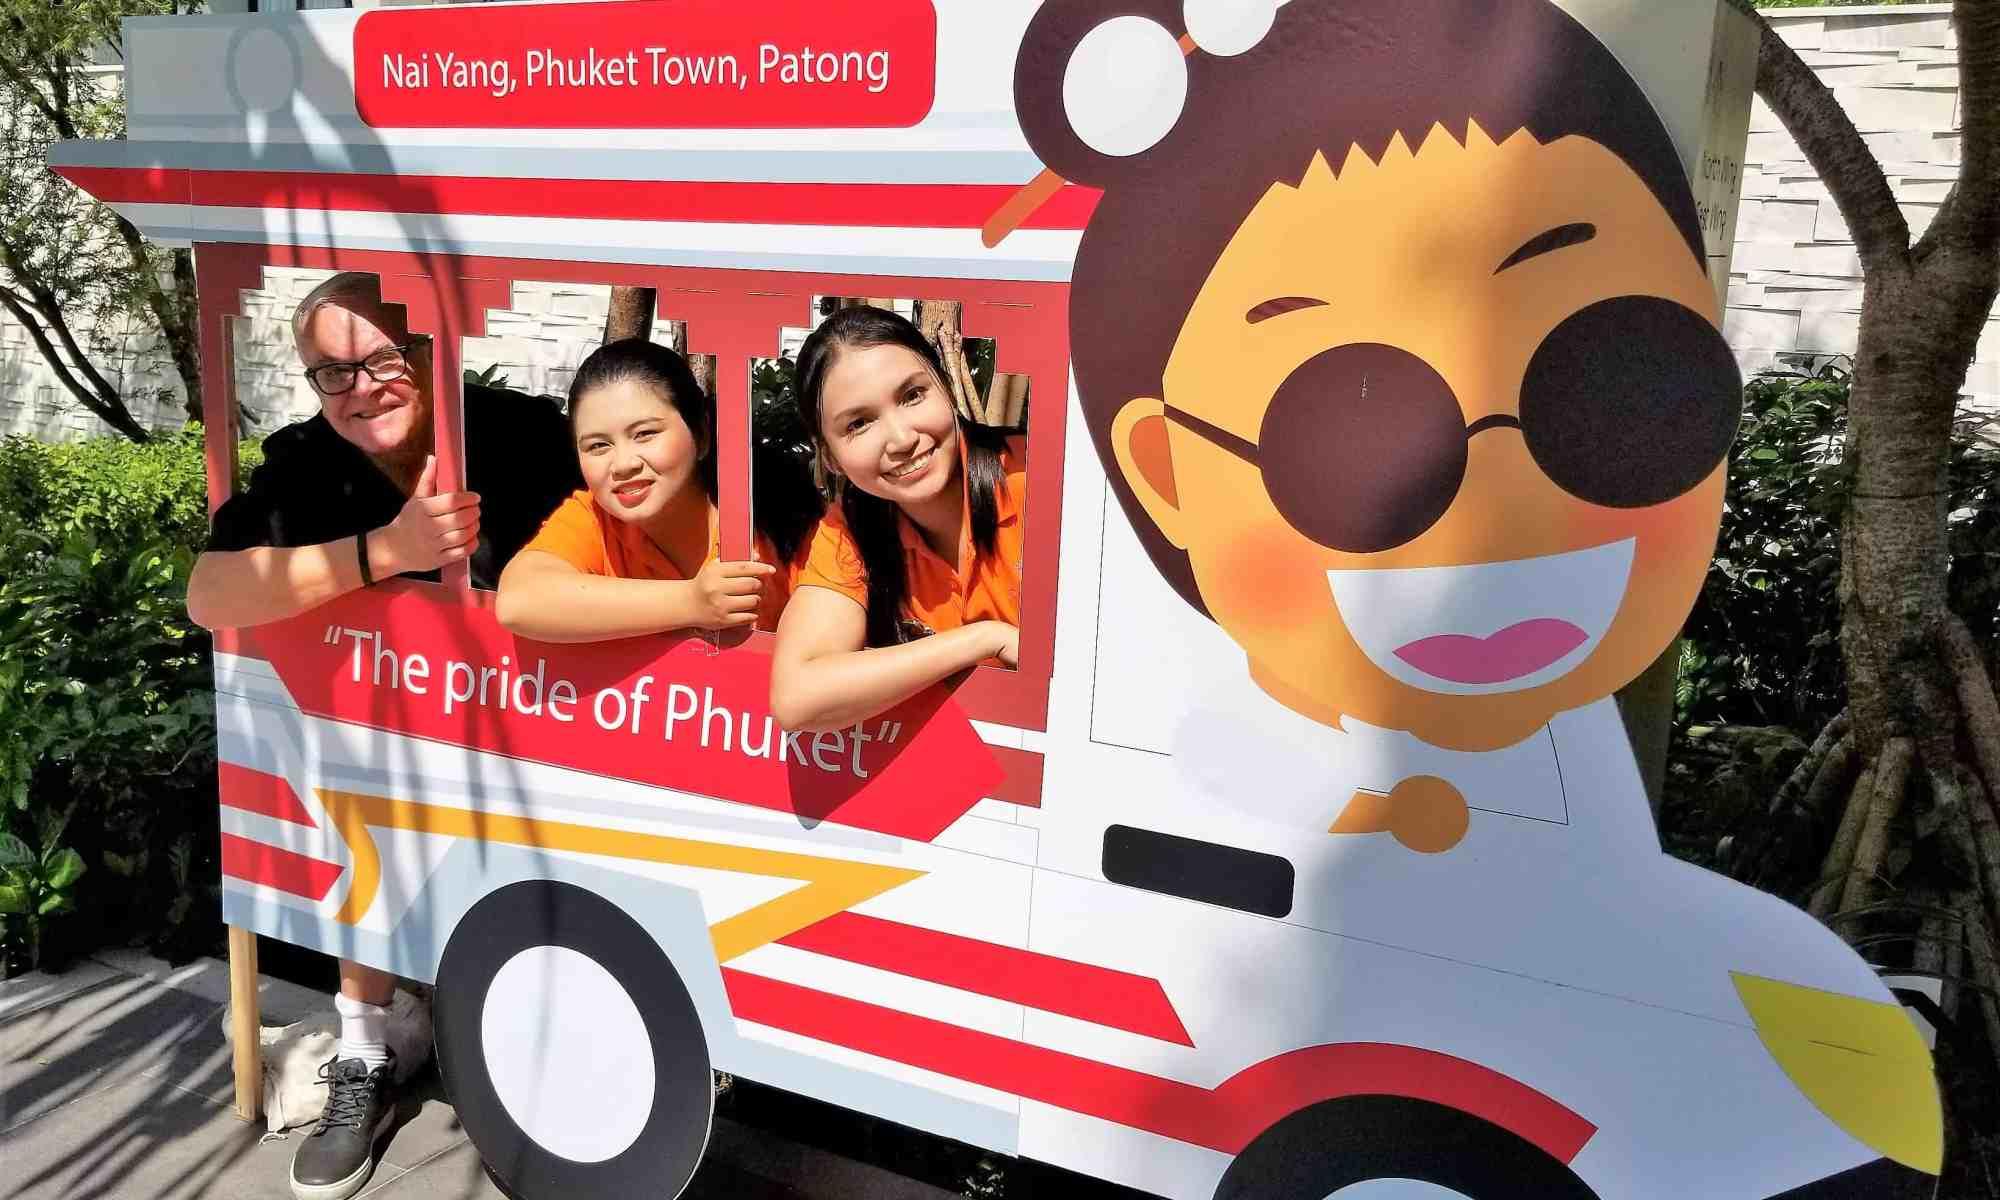 image-of-proud-phuket-thailand-hotel-selfie-prop